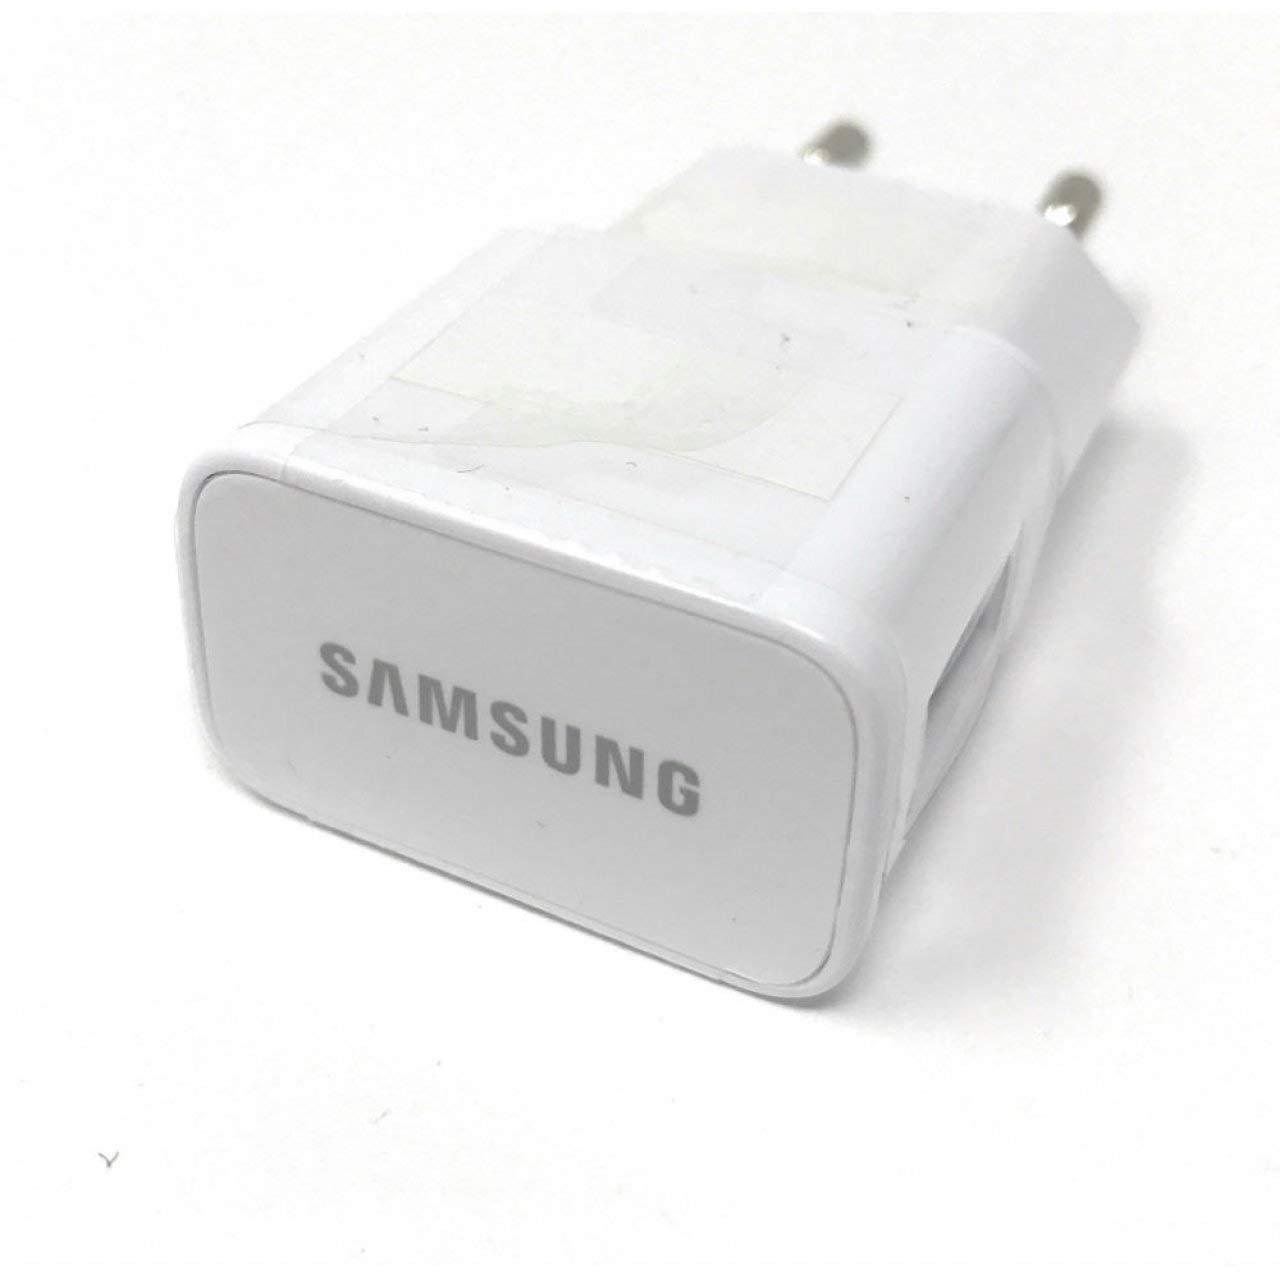 akku-net Original Samsung Cargador/Adaptador de carga para ...